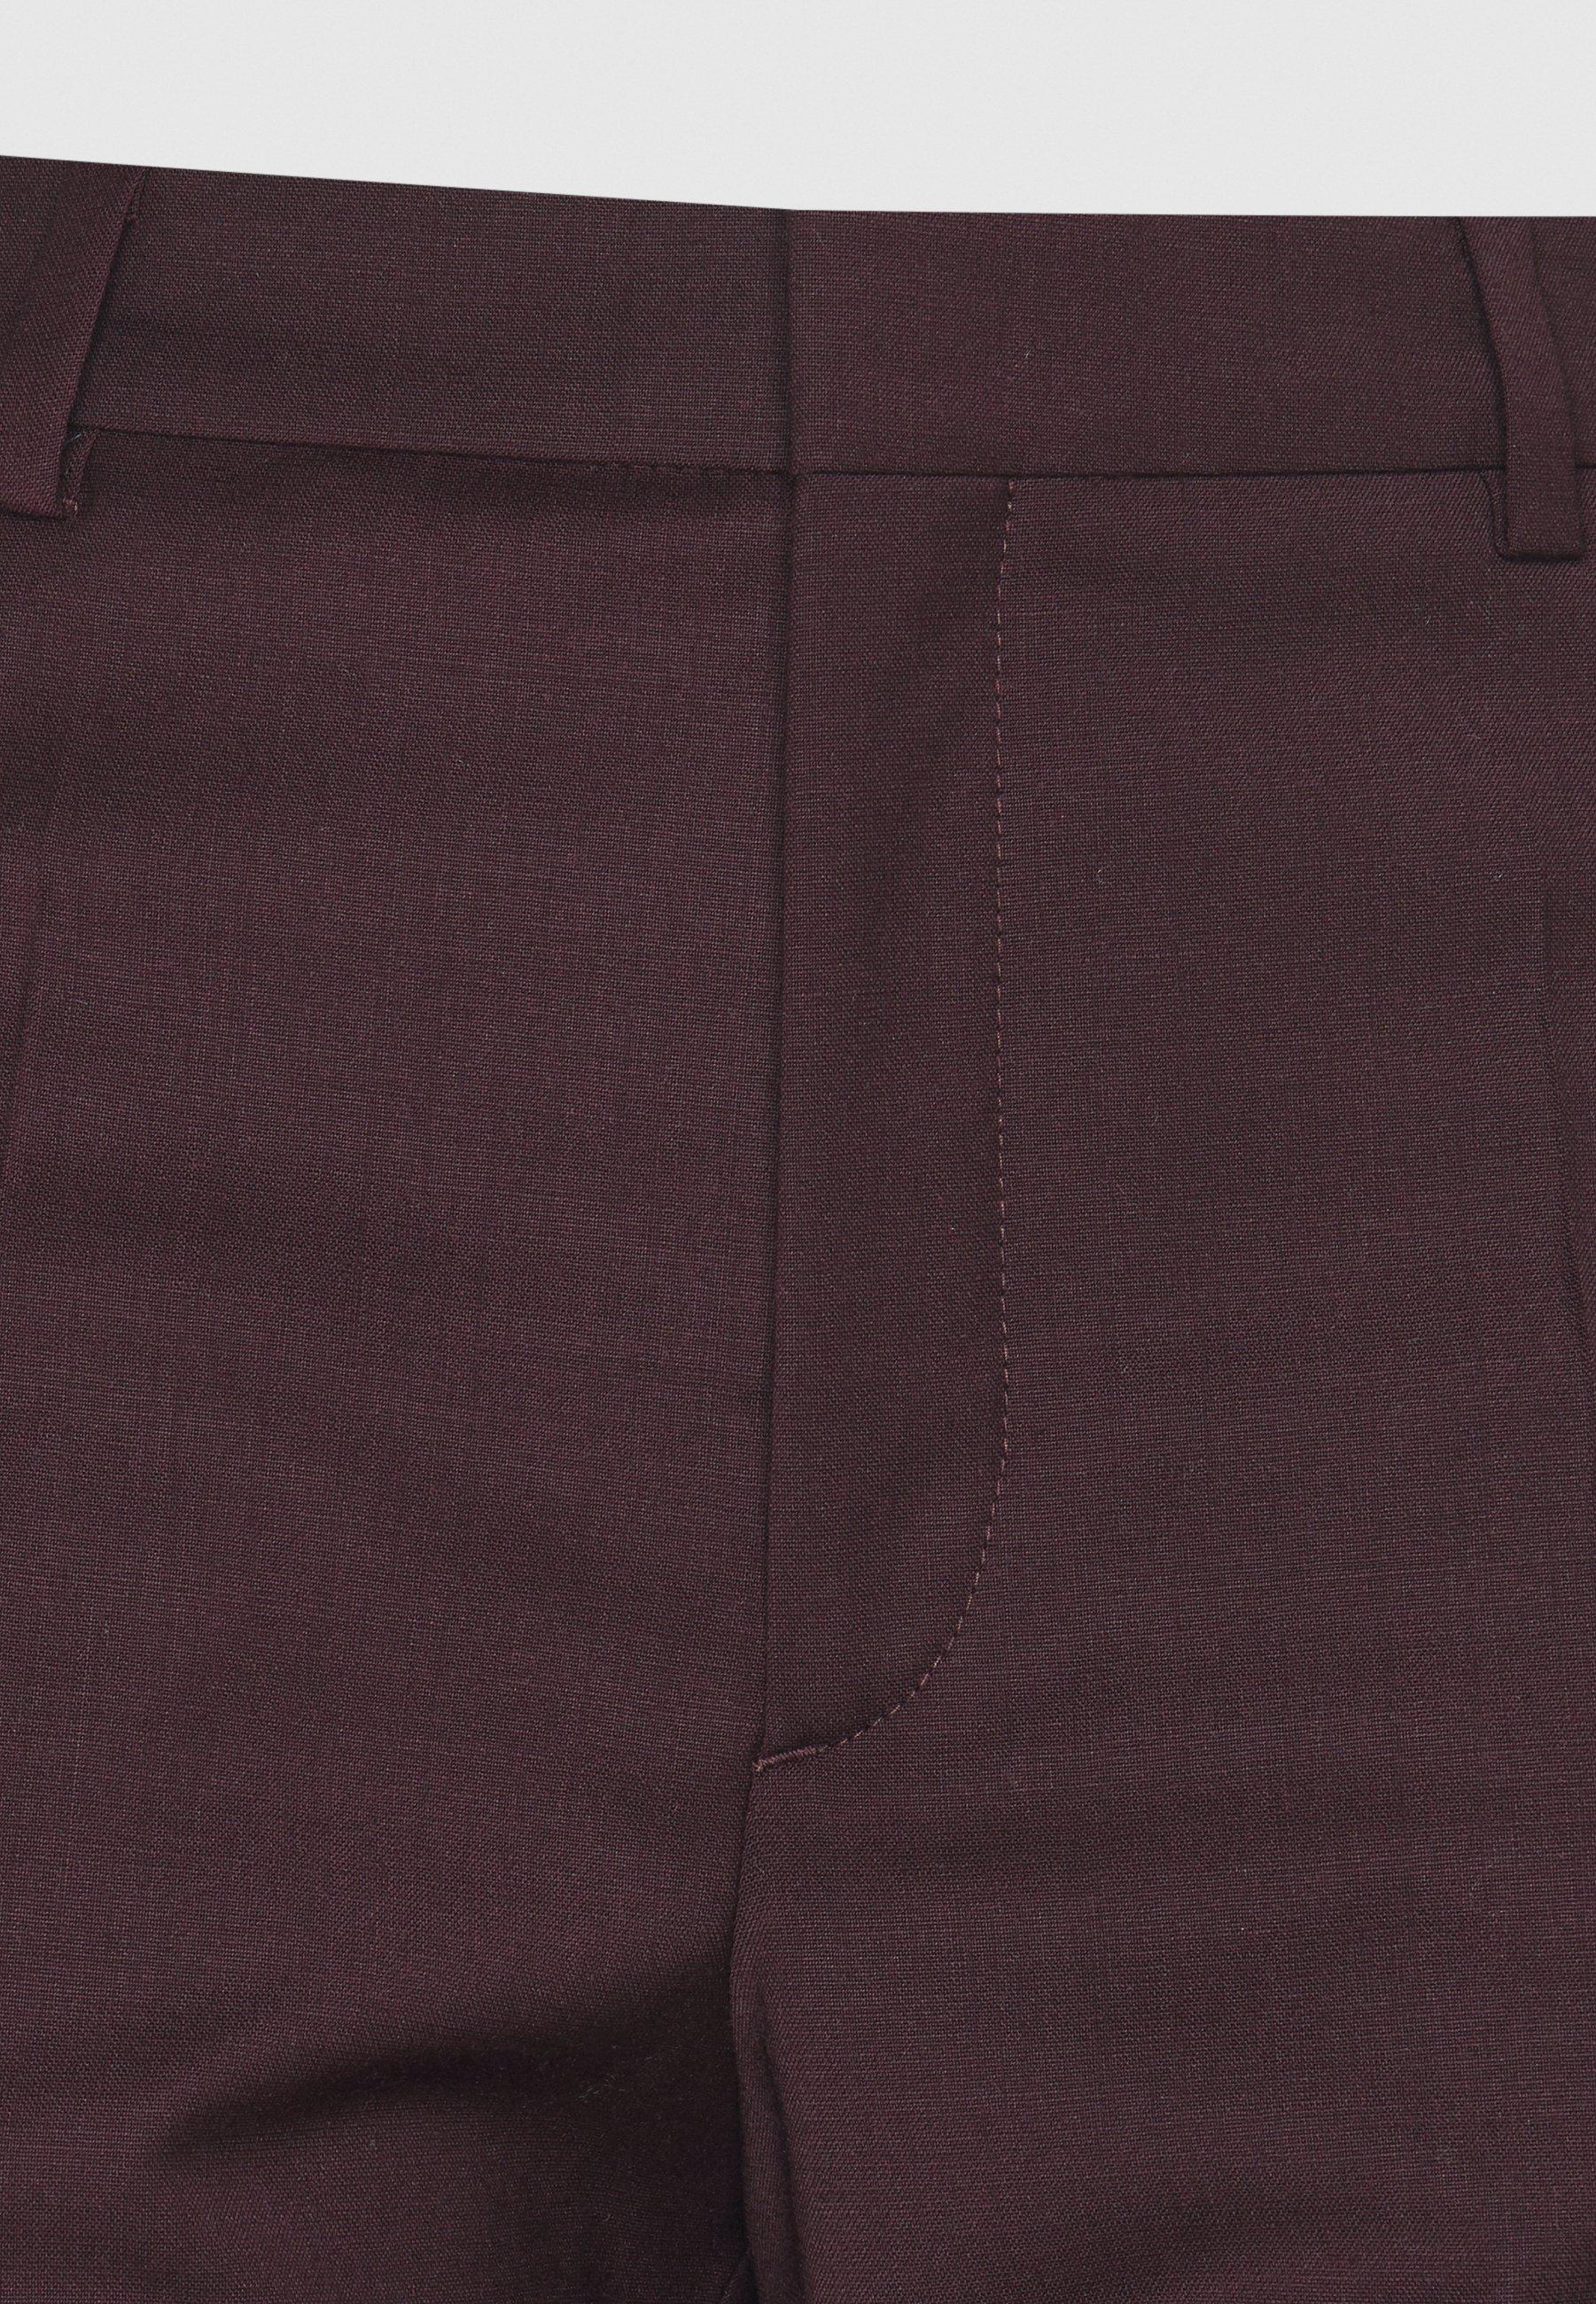 Filippa K EMMA CROPPED COOL TROUSER - Pantalon classique - maroon - Pantalons & Leggings Femme DJMs5